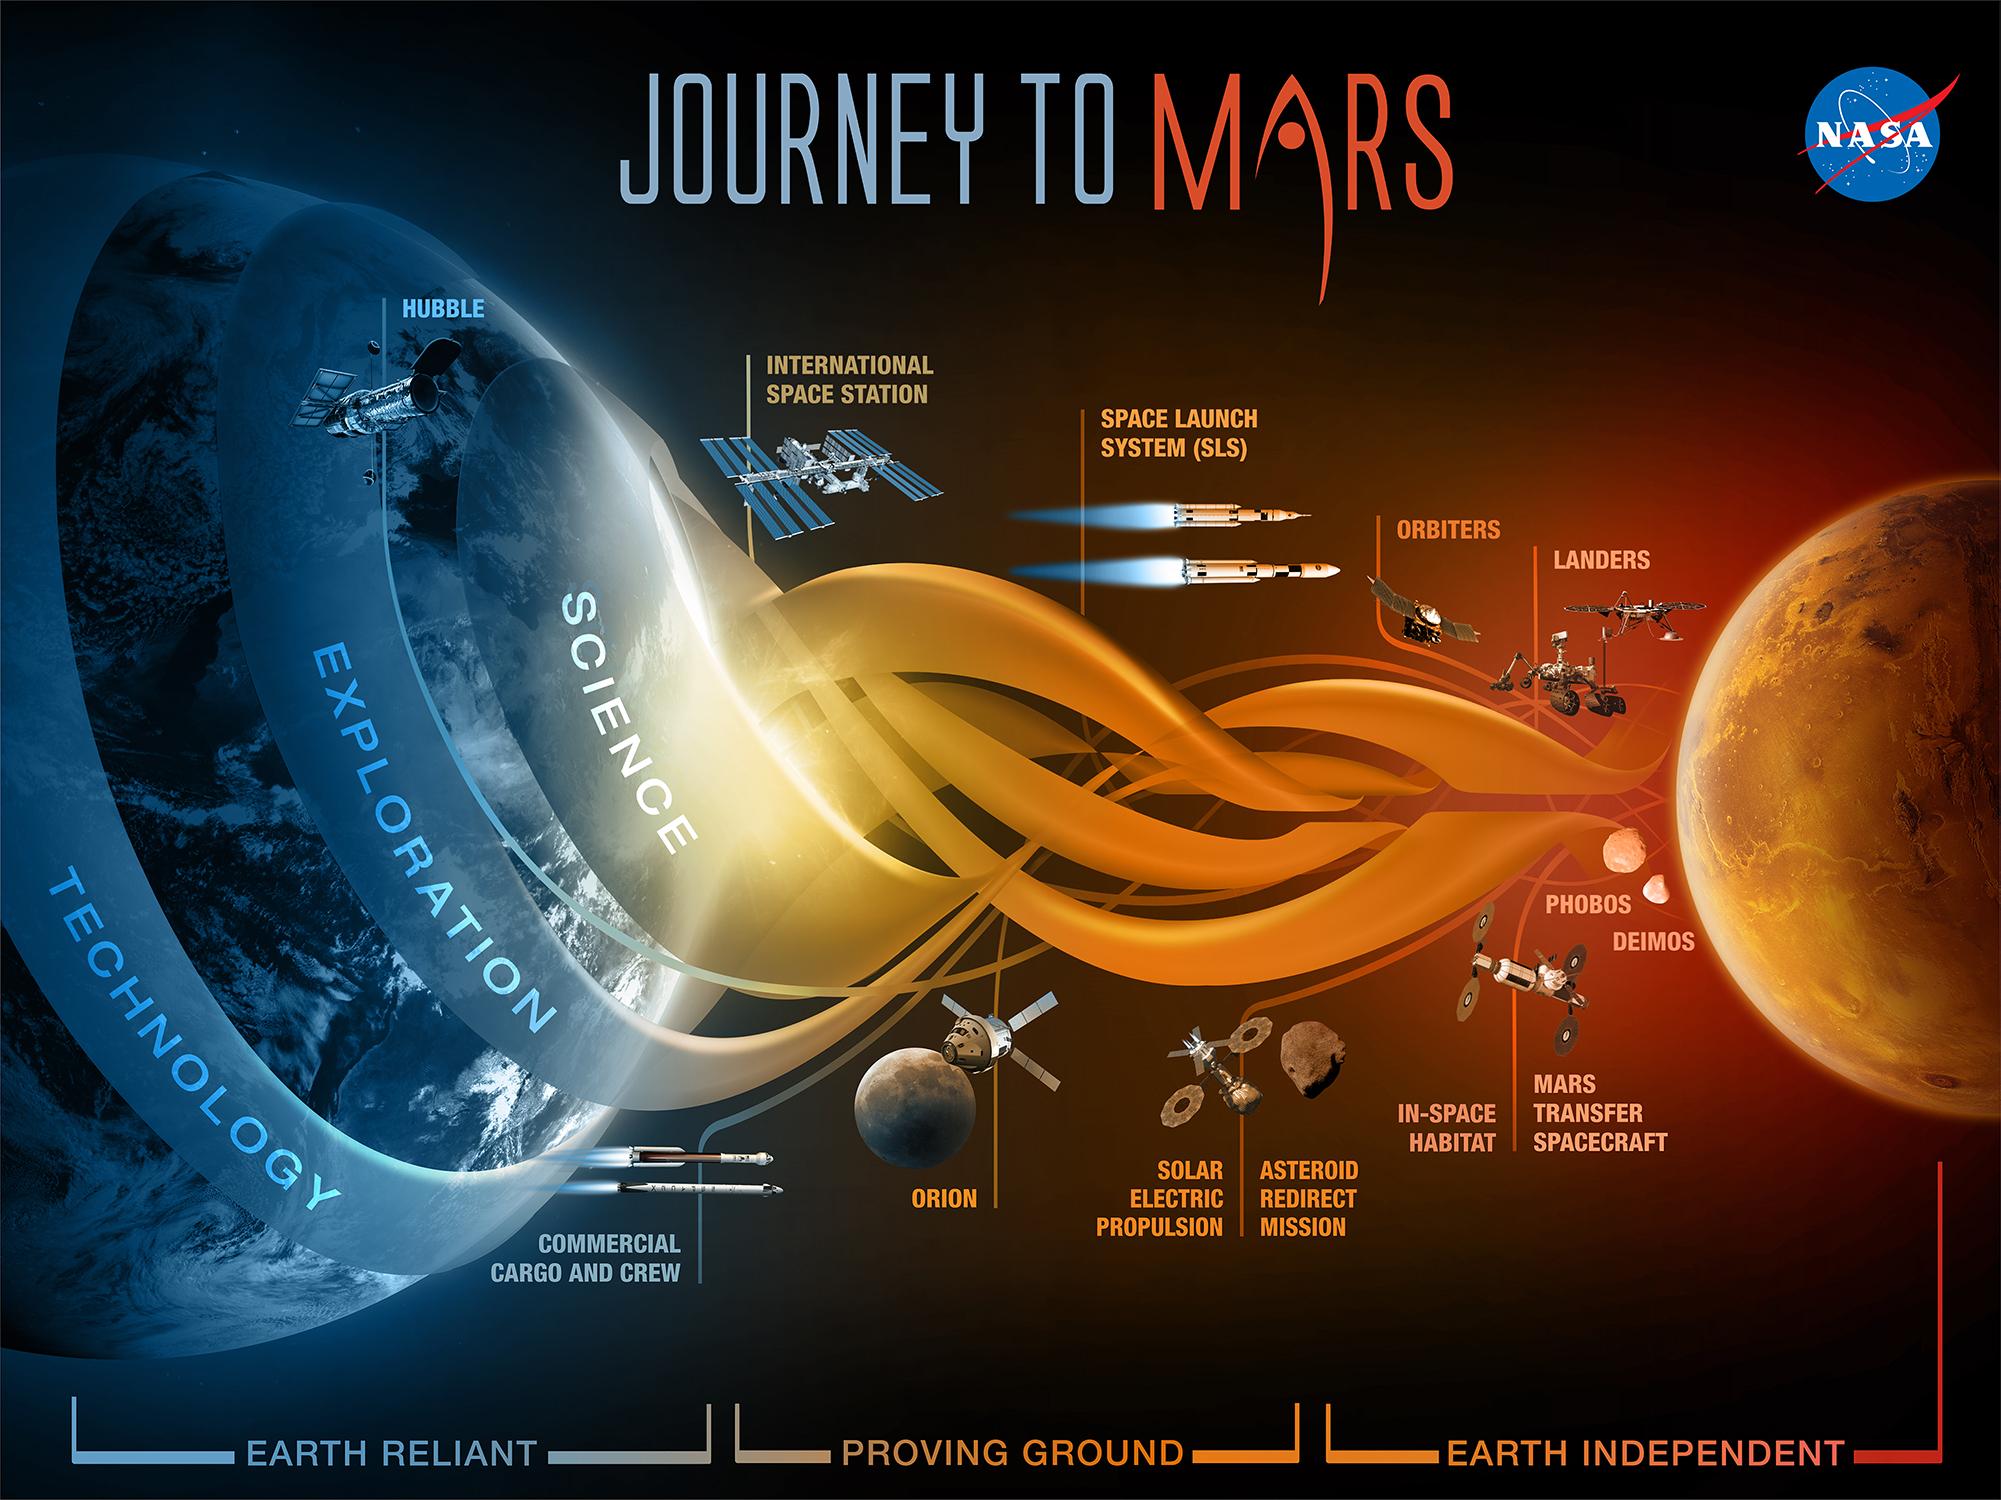 http://blogs.nasa.gov/Rocketology/wp-content/uploads/sites/251/2015/09/Journey-to-Mars_2.jpg